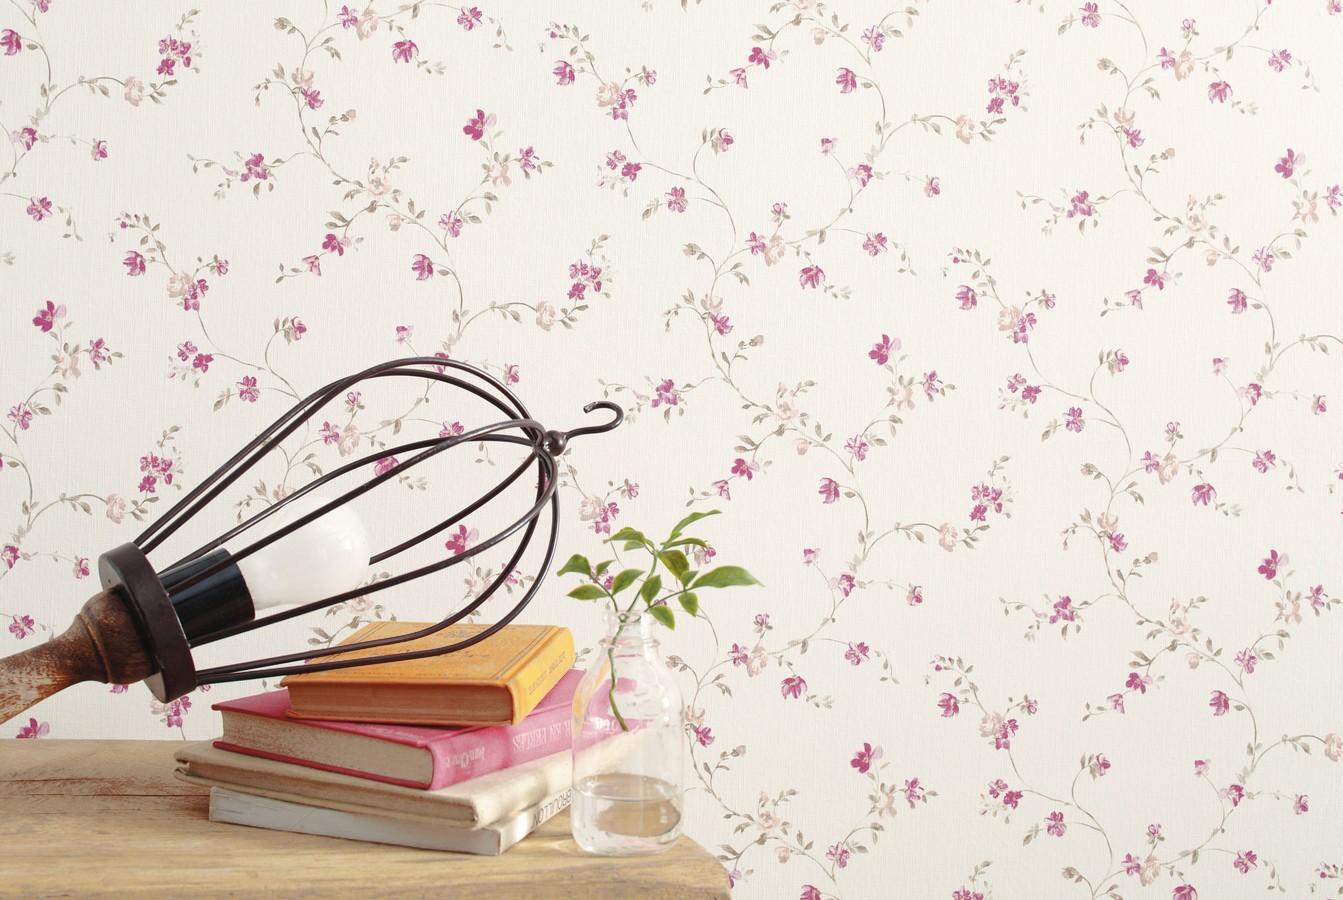 Papel pintado flores pequeñas liberty country magenta fondo blanco Rosana 421554